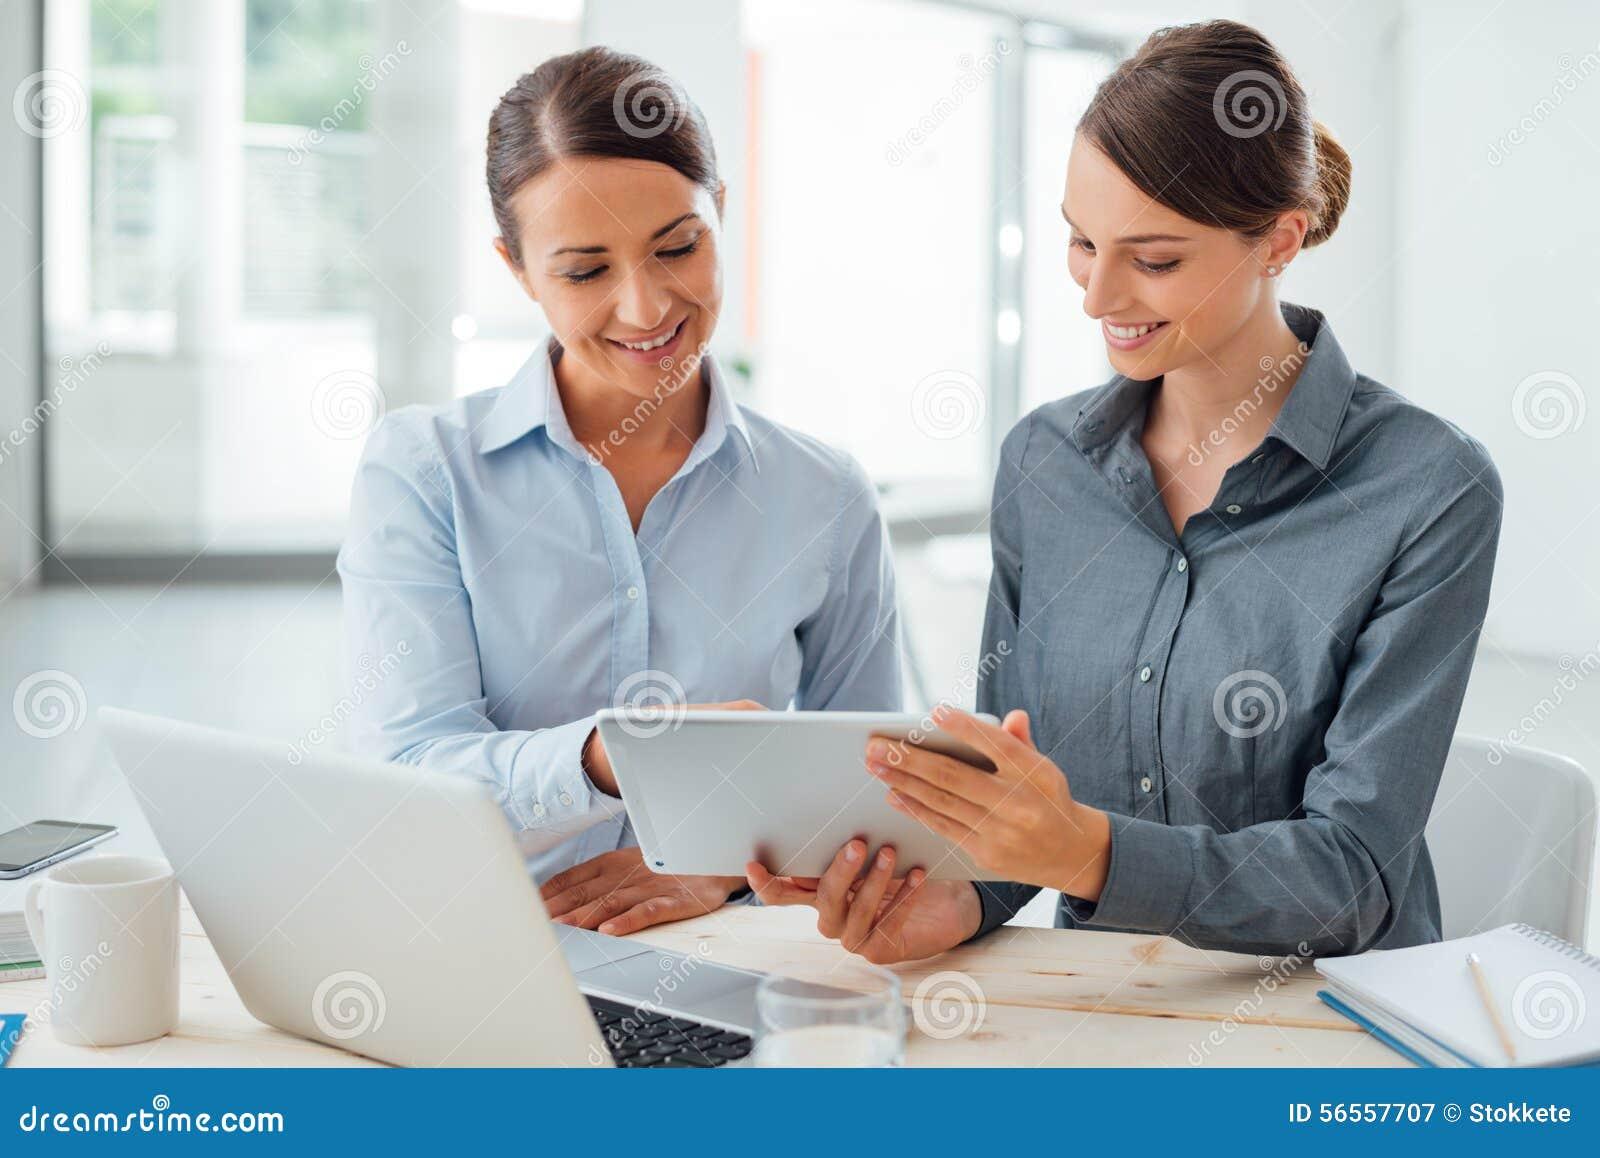 Download Επιχειρησιακές γυναίκες που εργάζονται μαζί σε μια ταμπλέτα Στοκ Εικόνα - εικόνα από διευθυντής, περιλαίμιο: 56557707